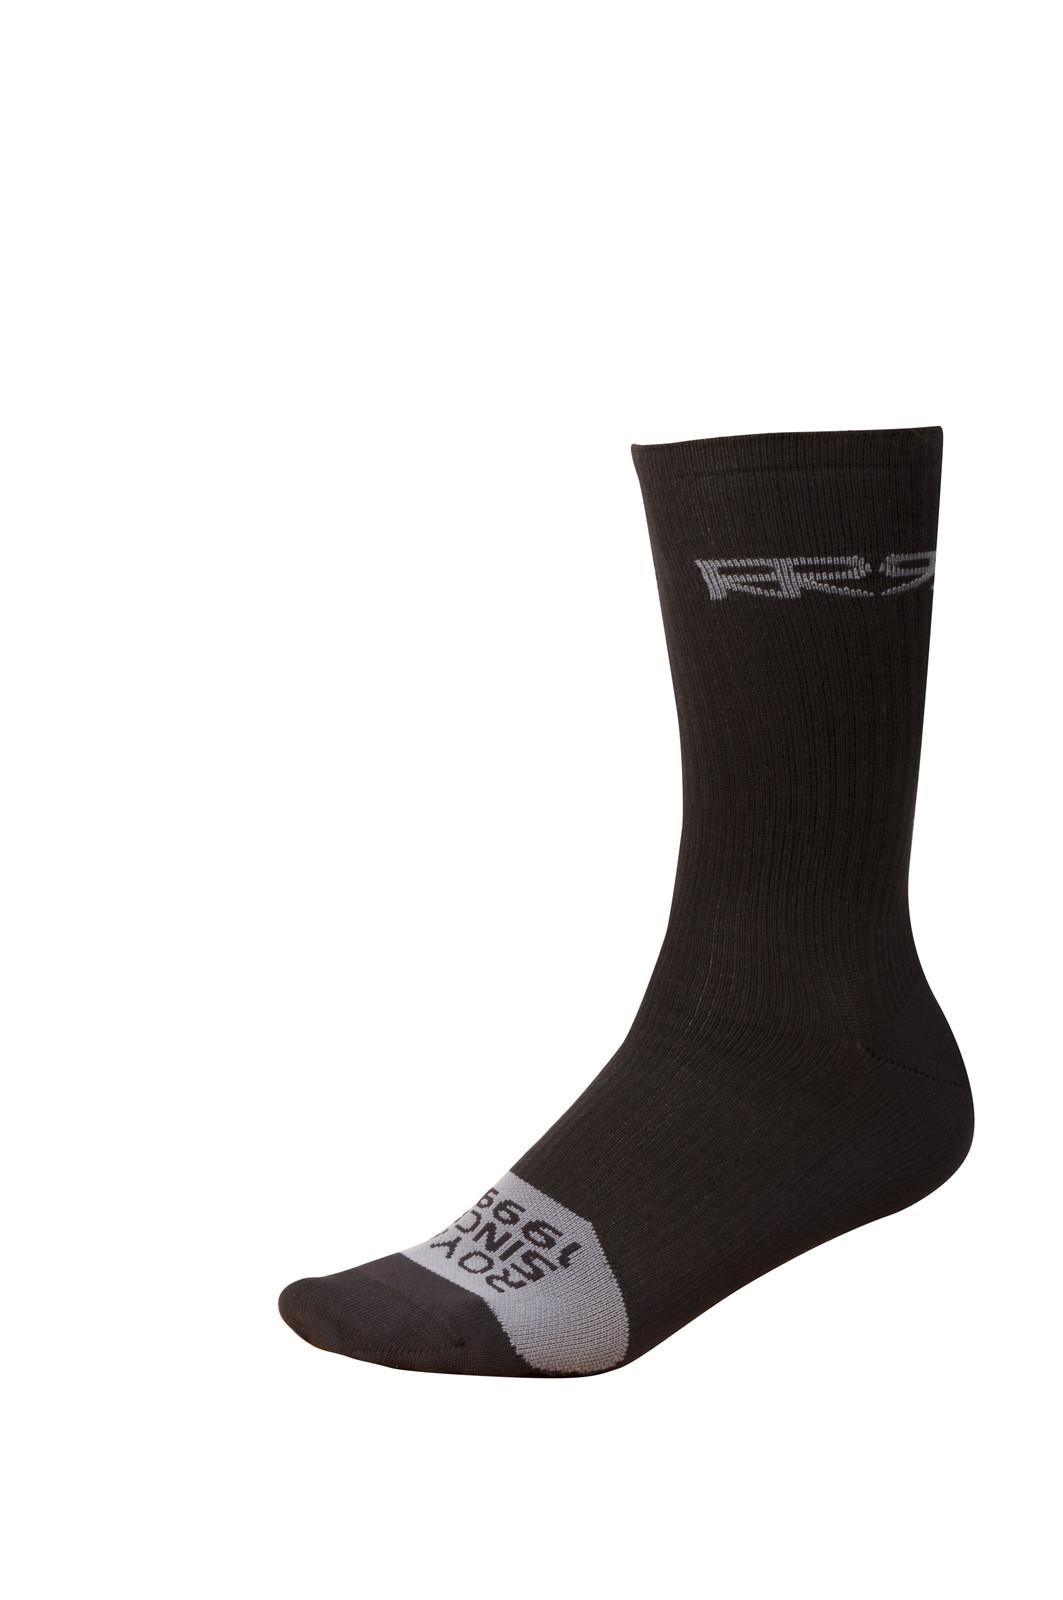 Royal_Racing_Crew_Sock_2017